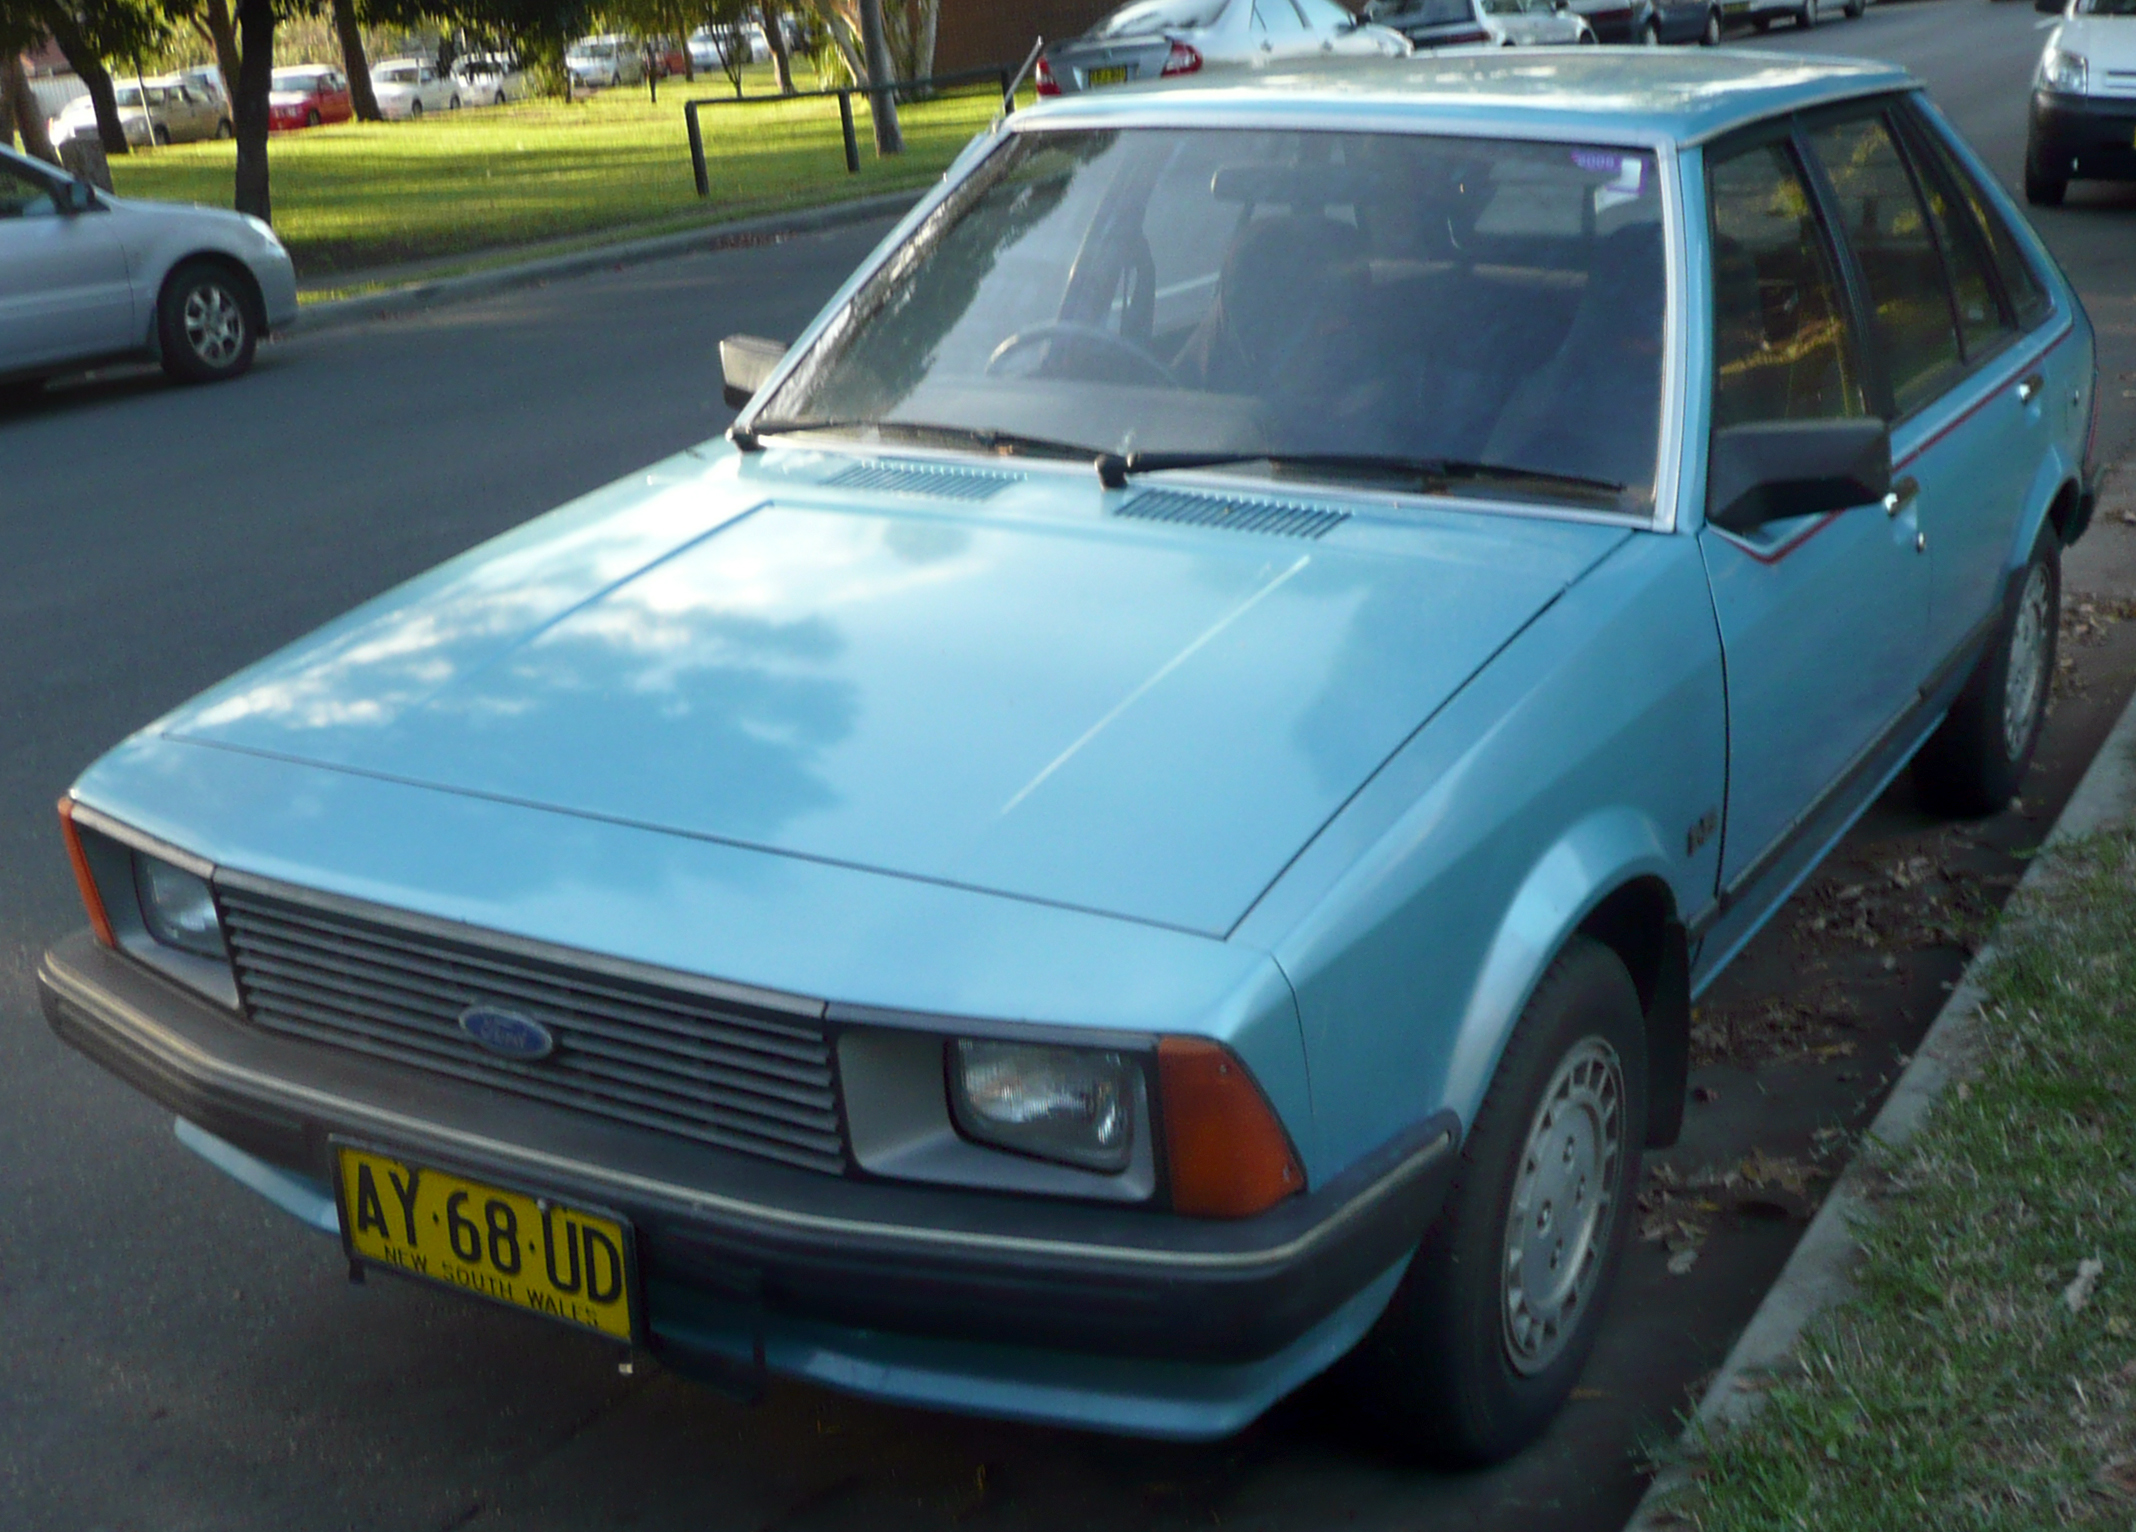 File:1981-1983 Ford Laser (KA) GL 5-door hatchback 01.jpg - Wikimedia Commons